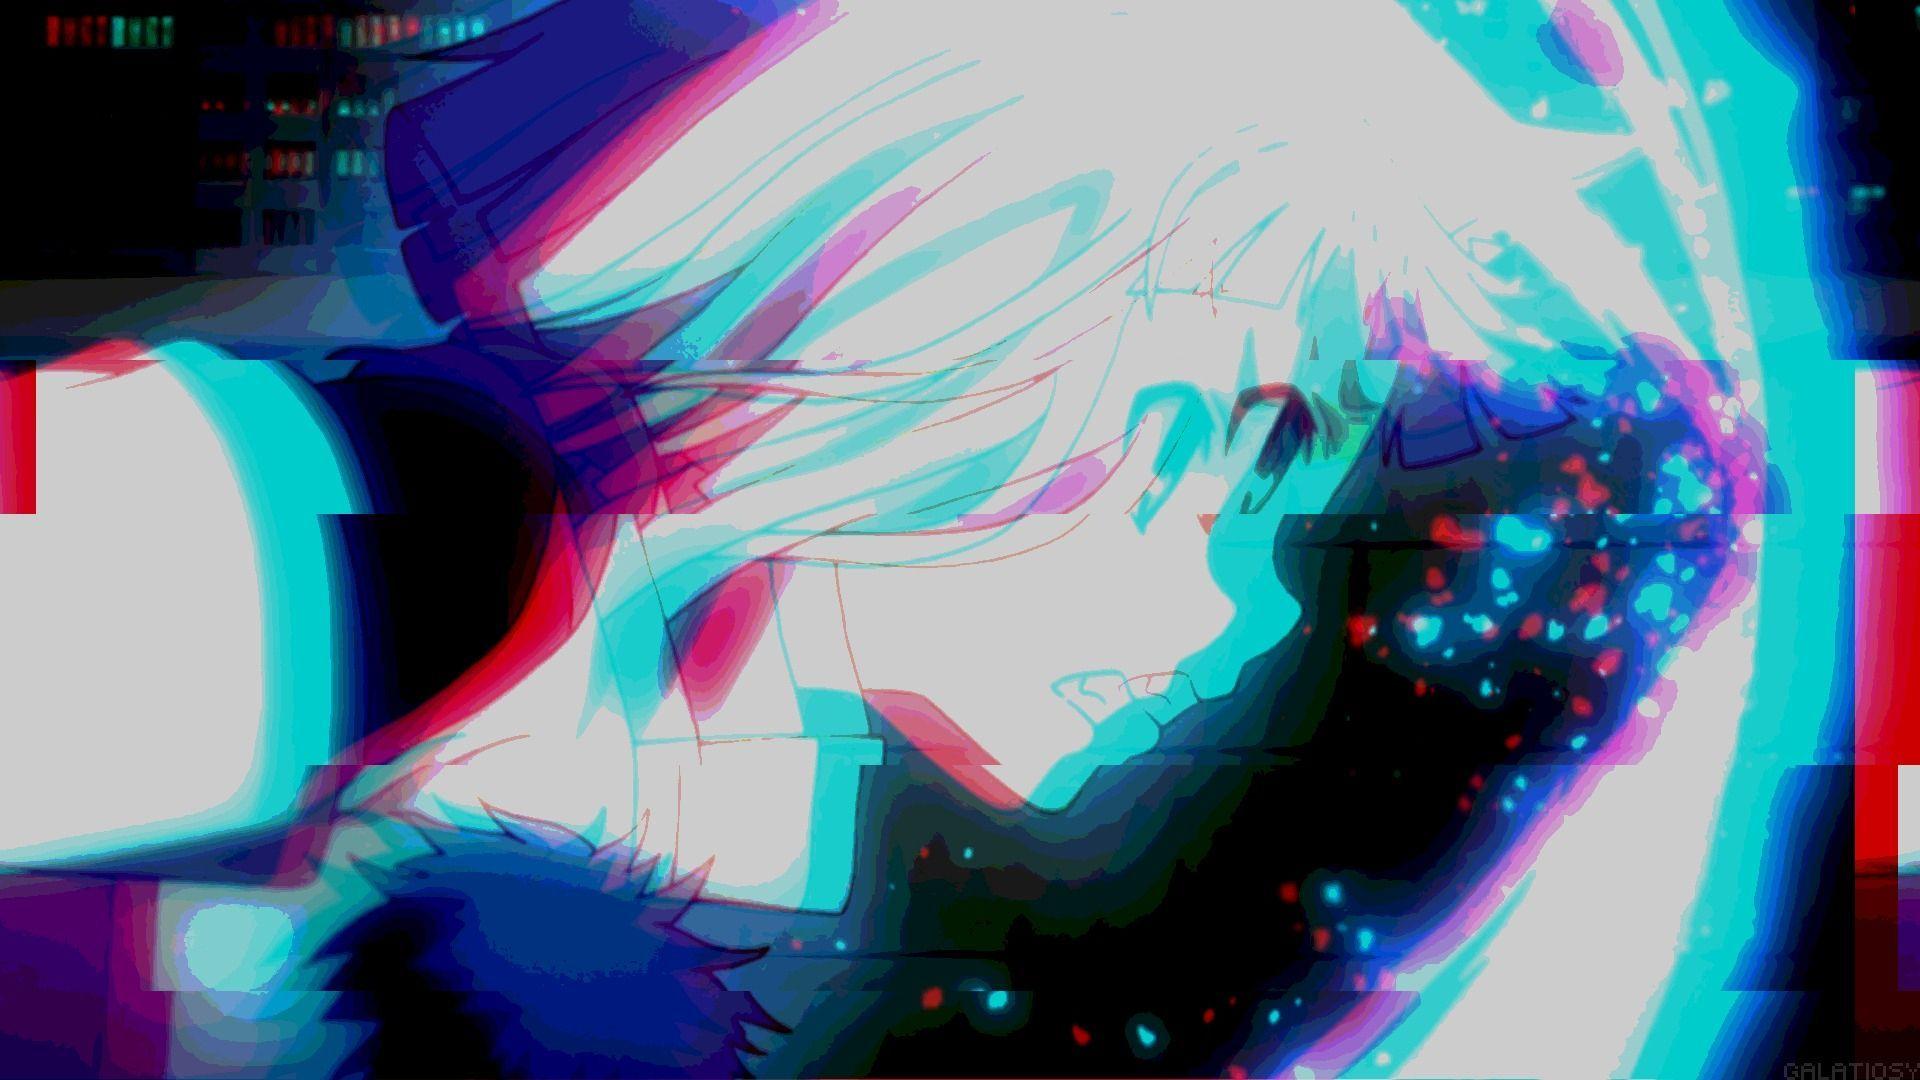 Aesthetic Anime Wallpaper Glitch in 2020   Glitch ...